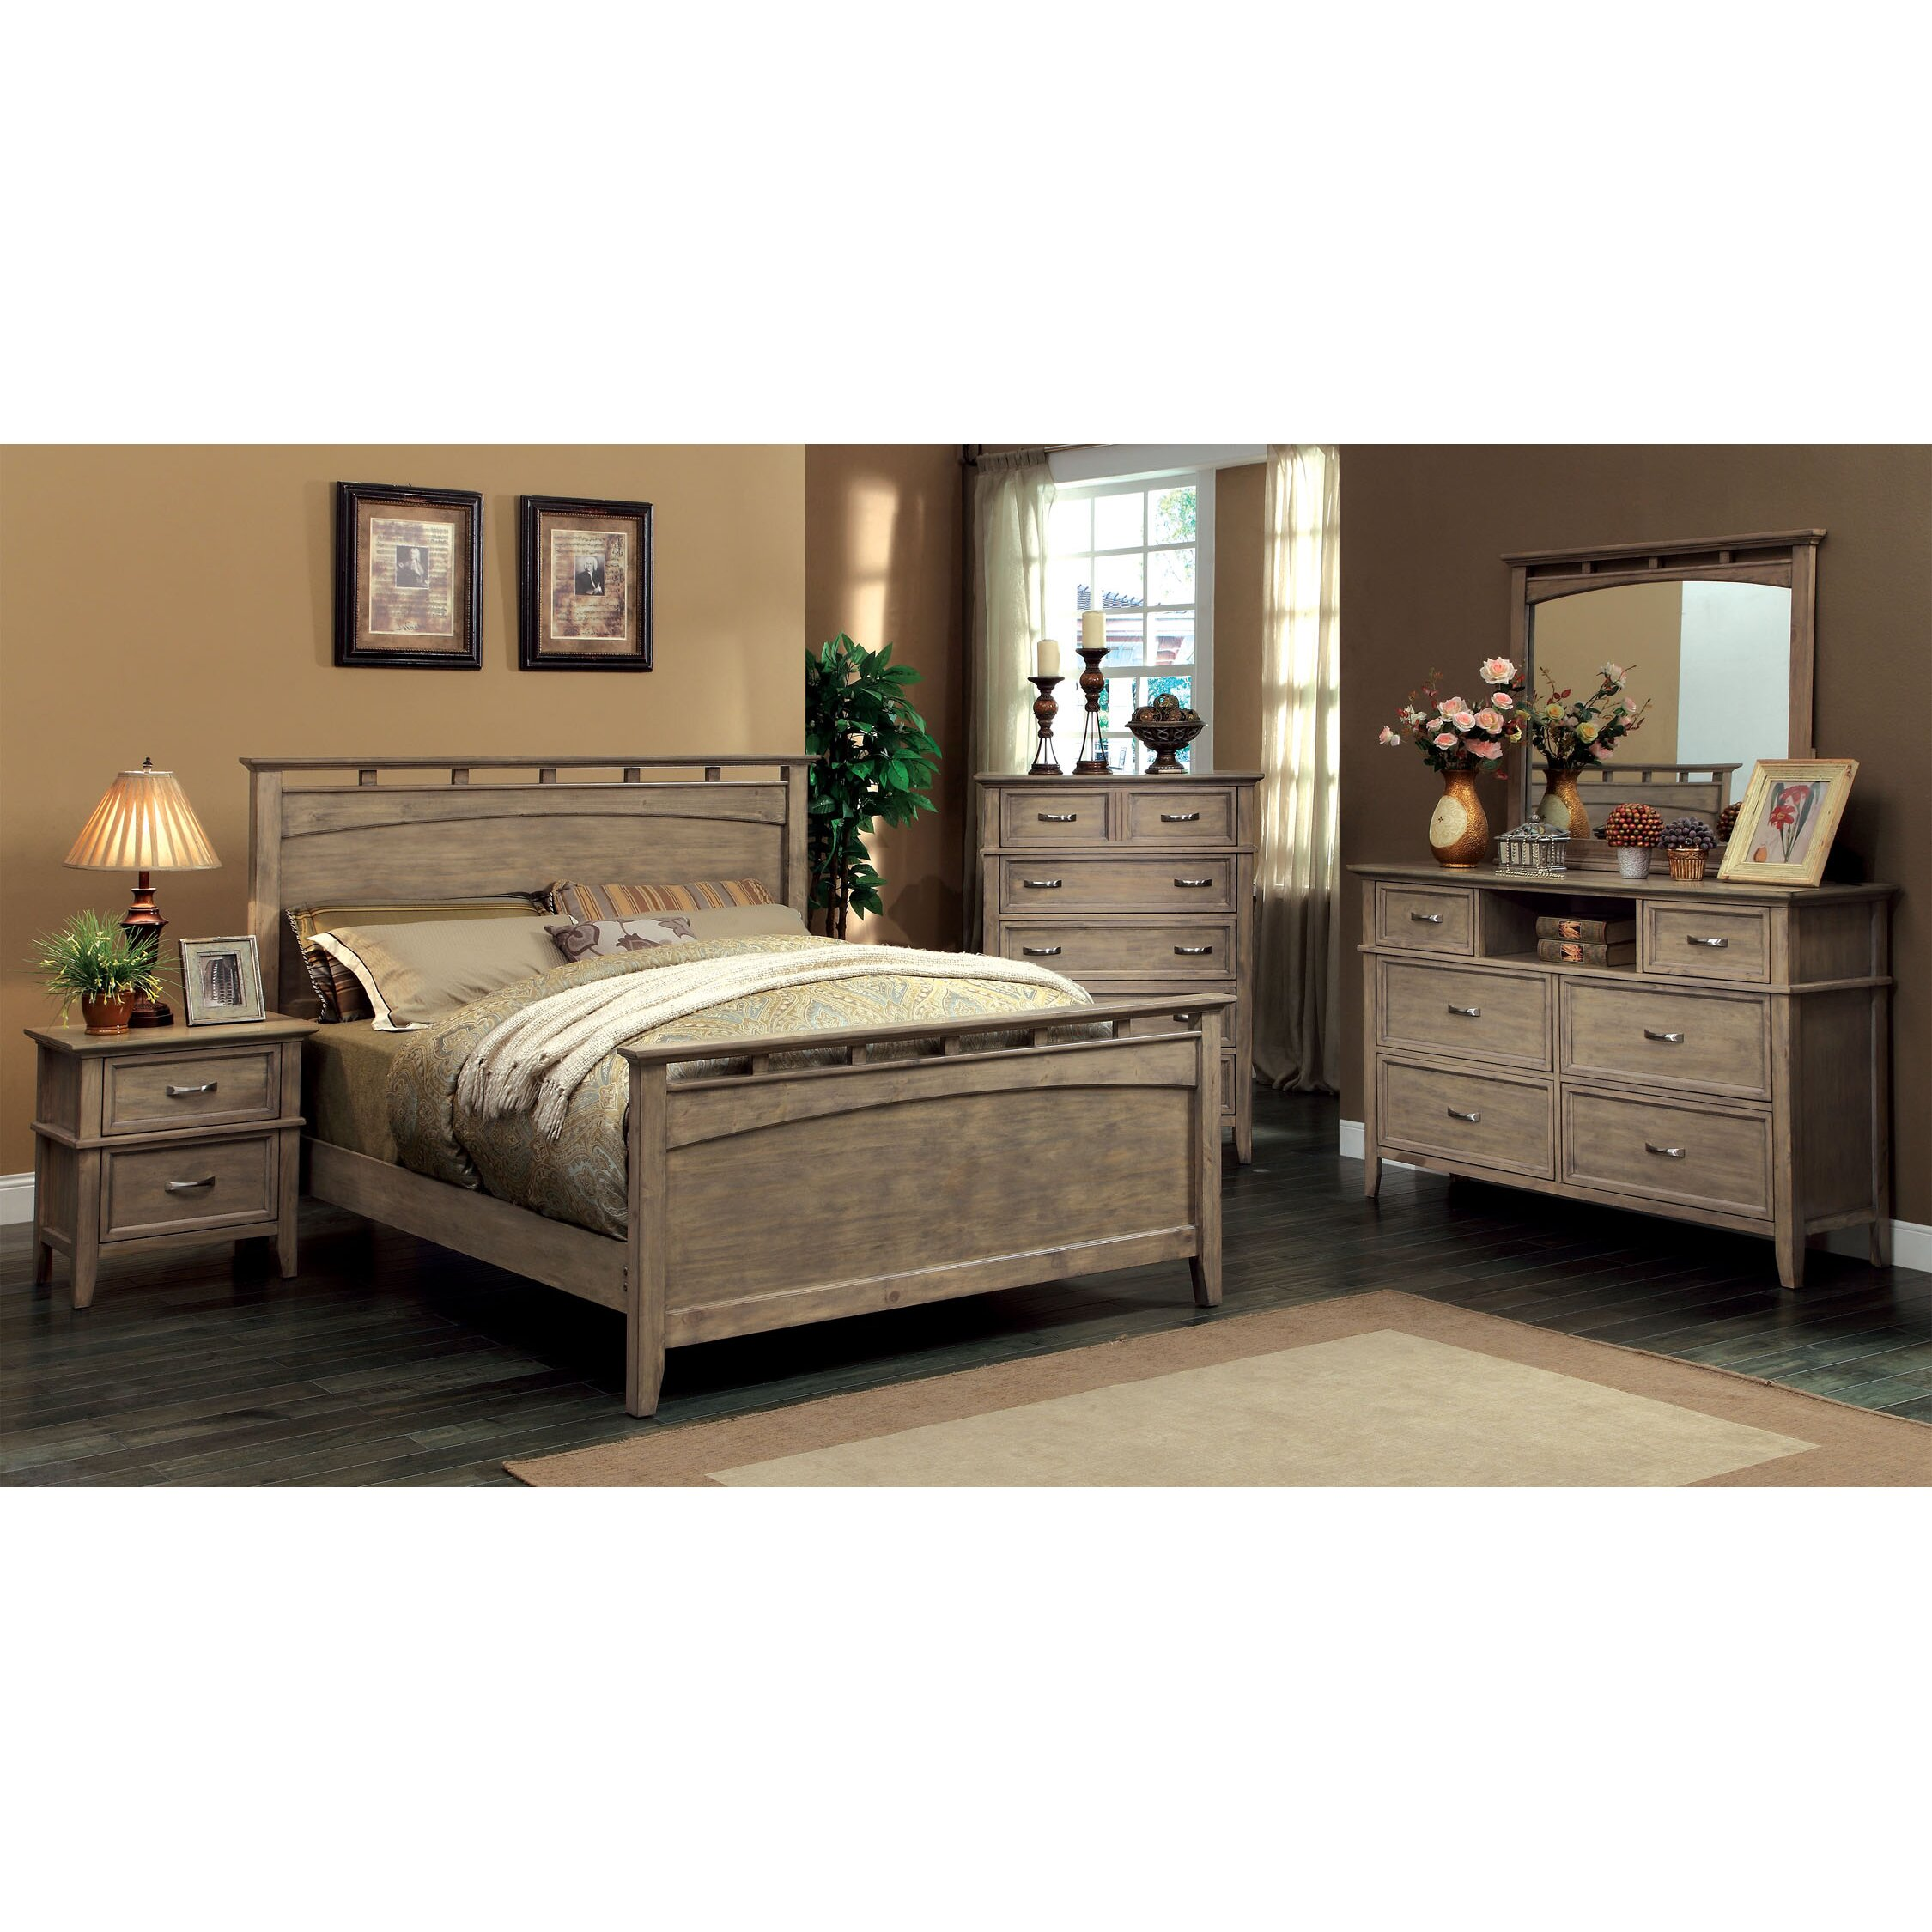 Hokku designs balboa panel bed reviews wayfair for Bedding styles 2014